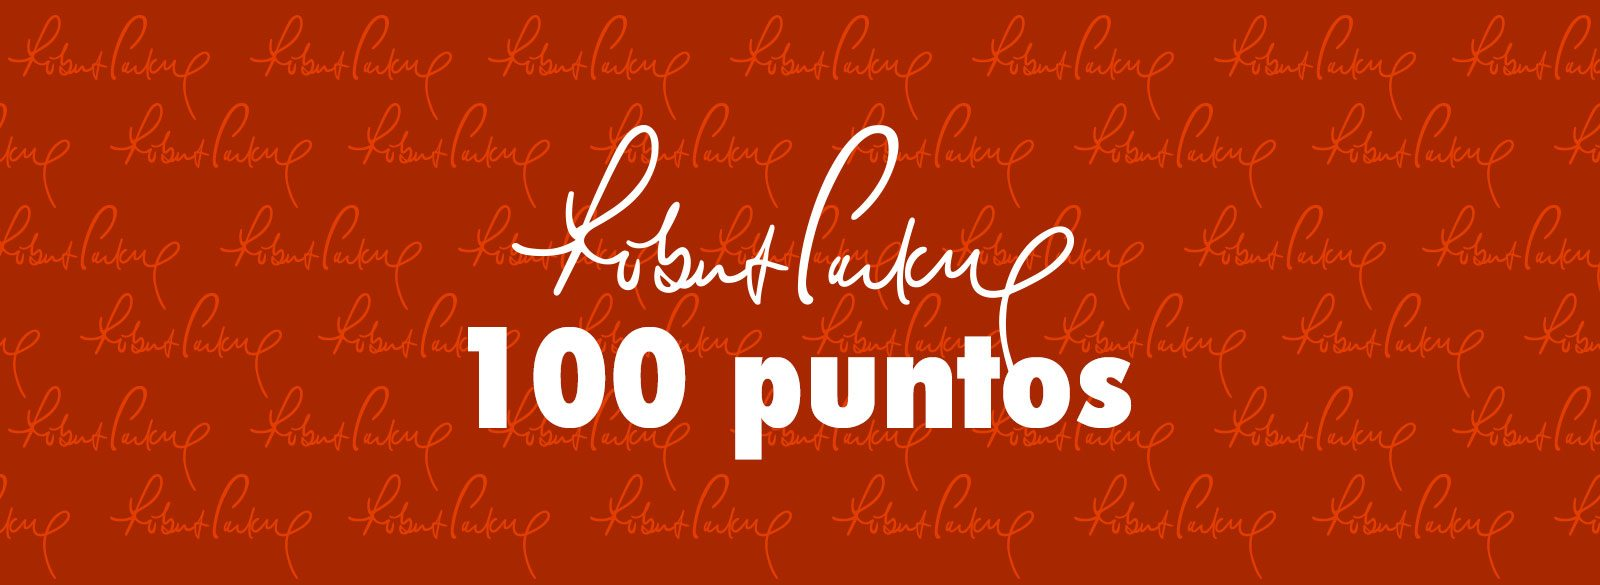 Bodegas españolas con 100 puntos Parker